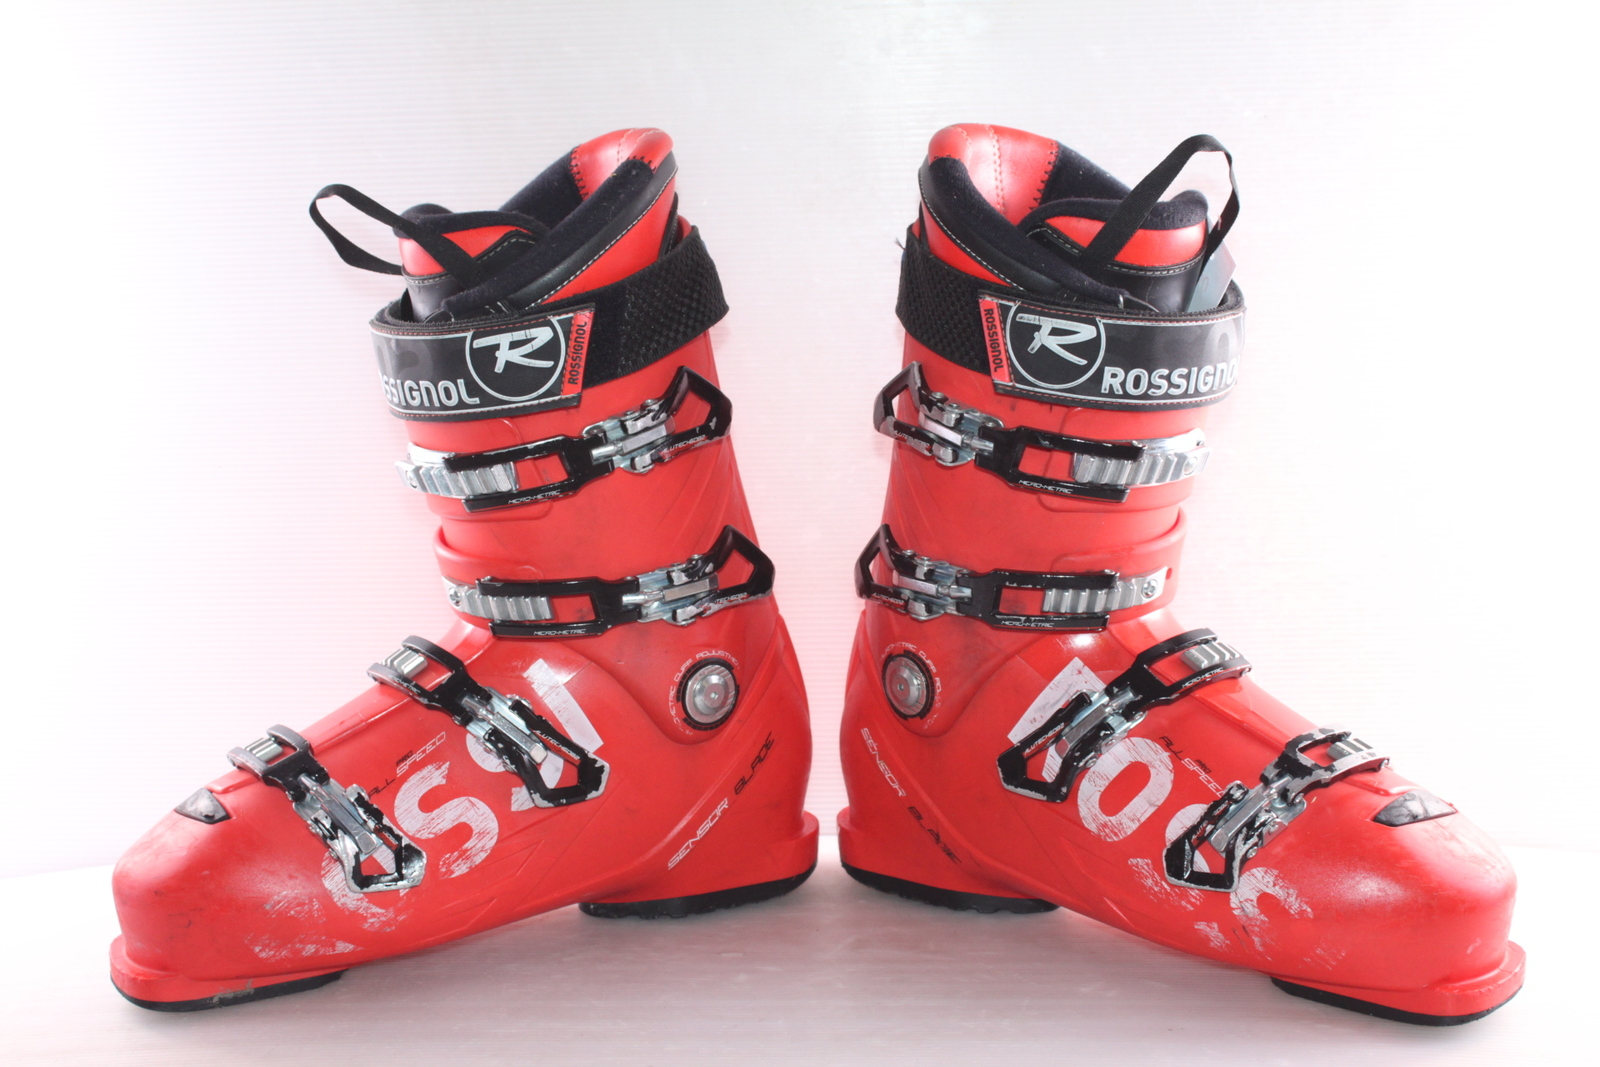 Lyžařské boty Rossignol All Speed Pro vel. EU44.5 flexe 90